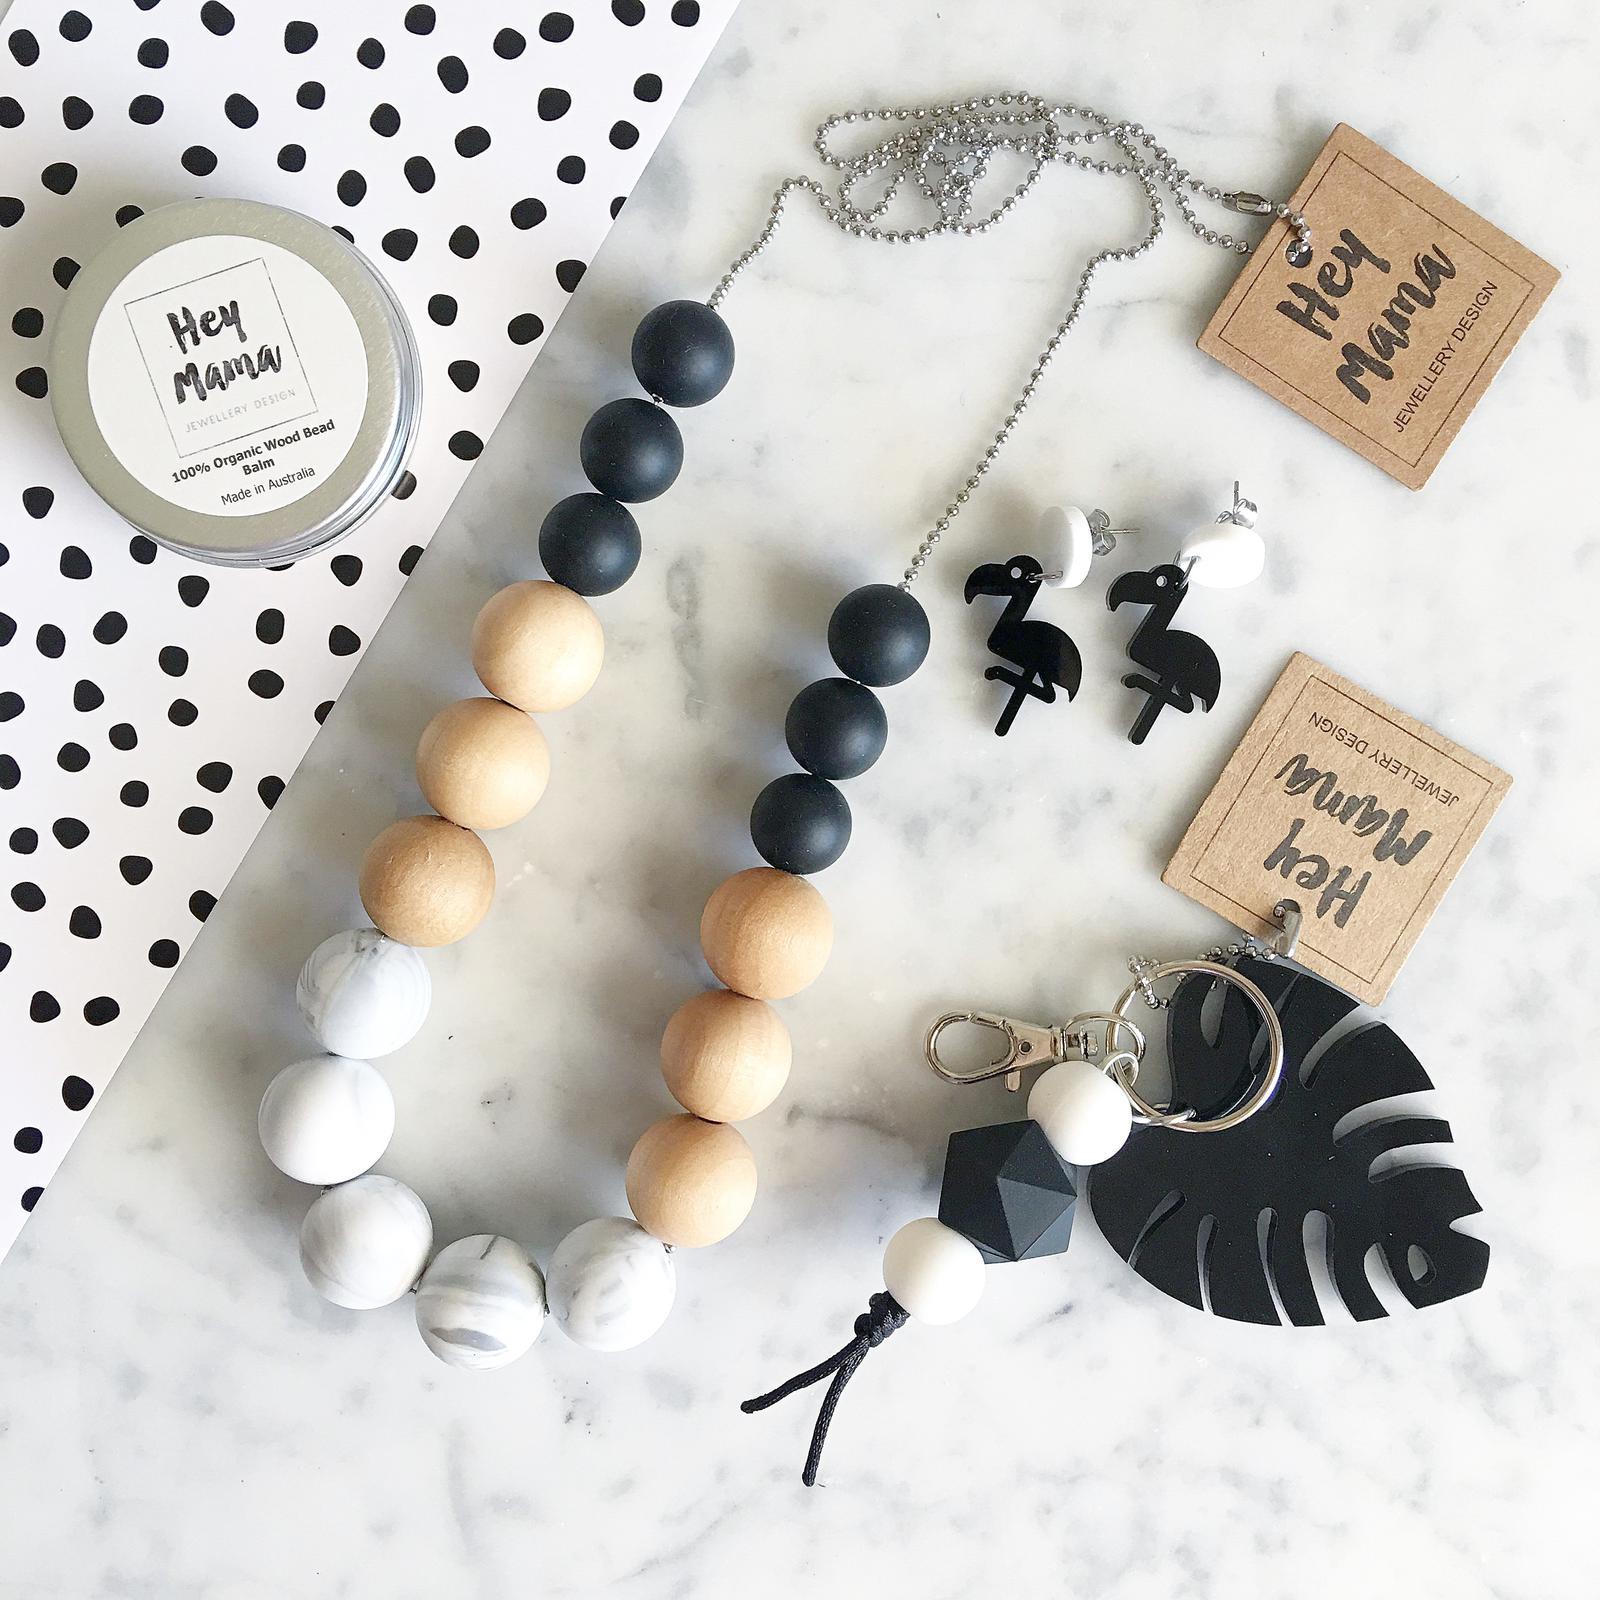 Luna necklaces keychain earrings